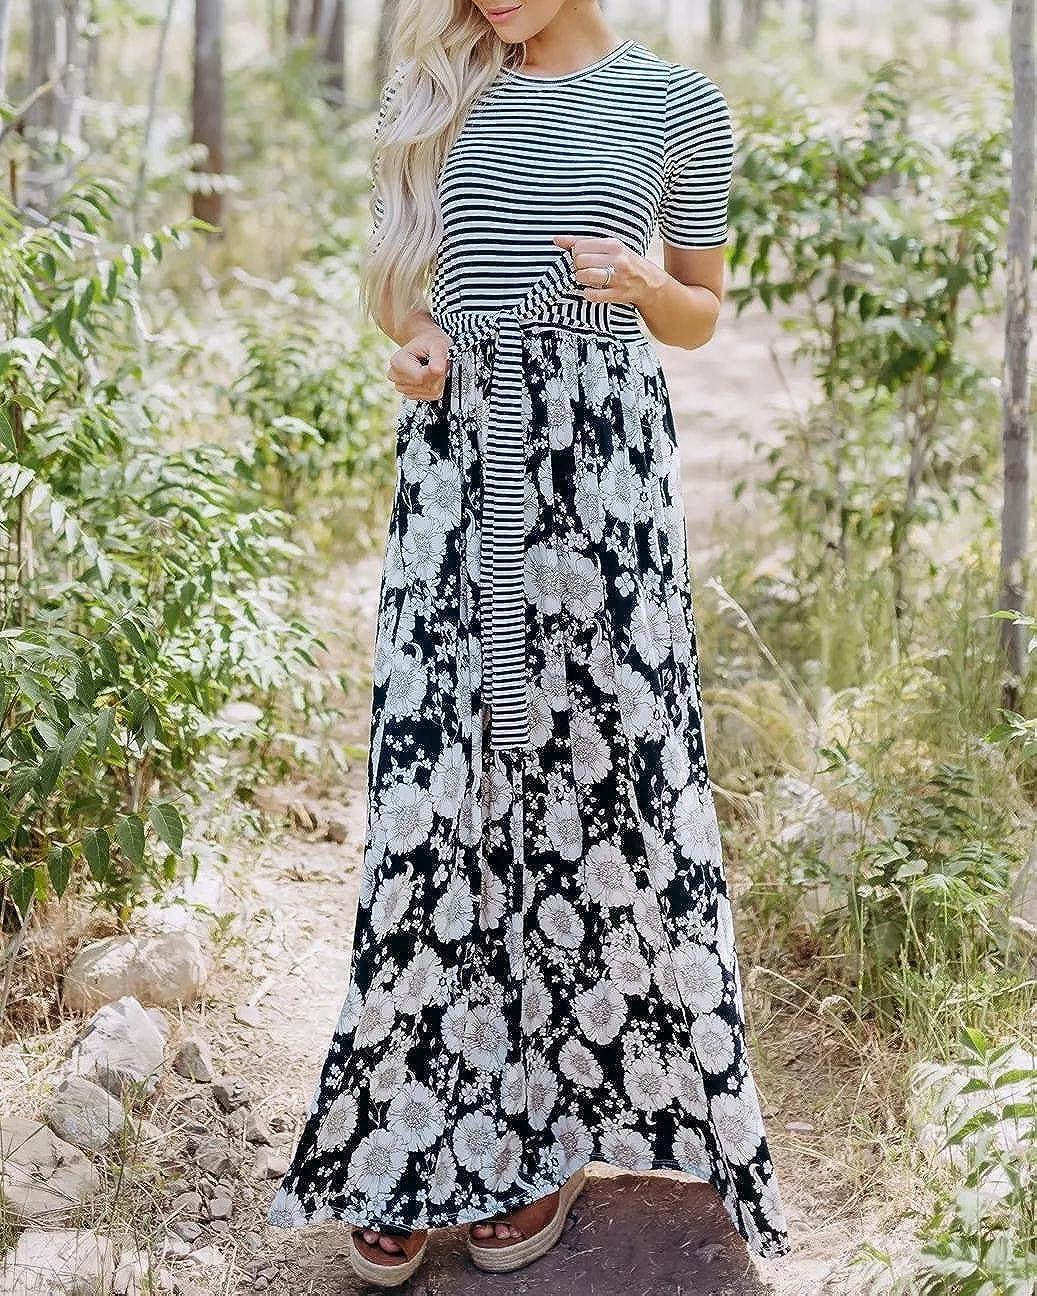 bba36a76e3e Valphsio Womens Short Sleeve Maxi Dresses Floral Print Patchwork Tie Waist  Boho Long Dress at Amazon Women s Clothing store